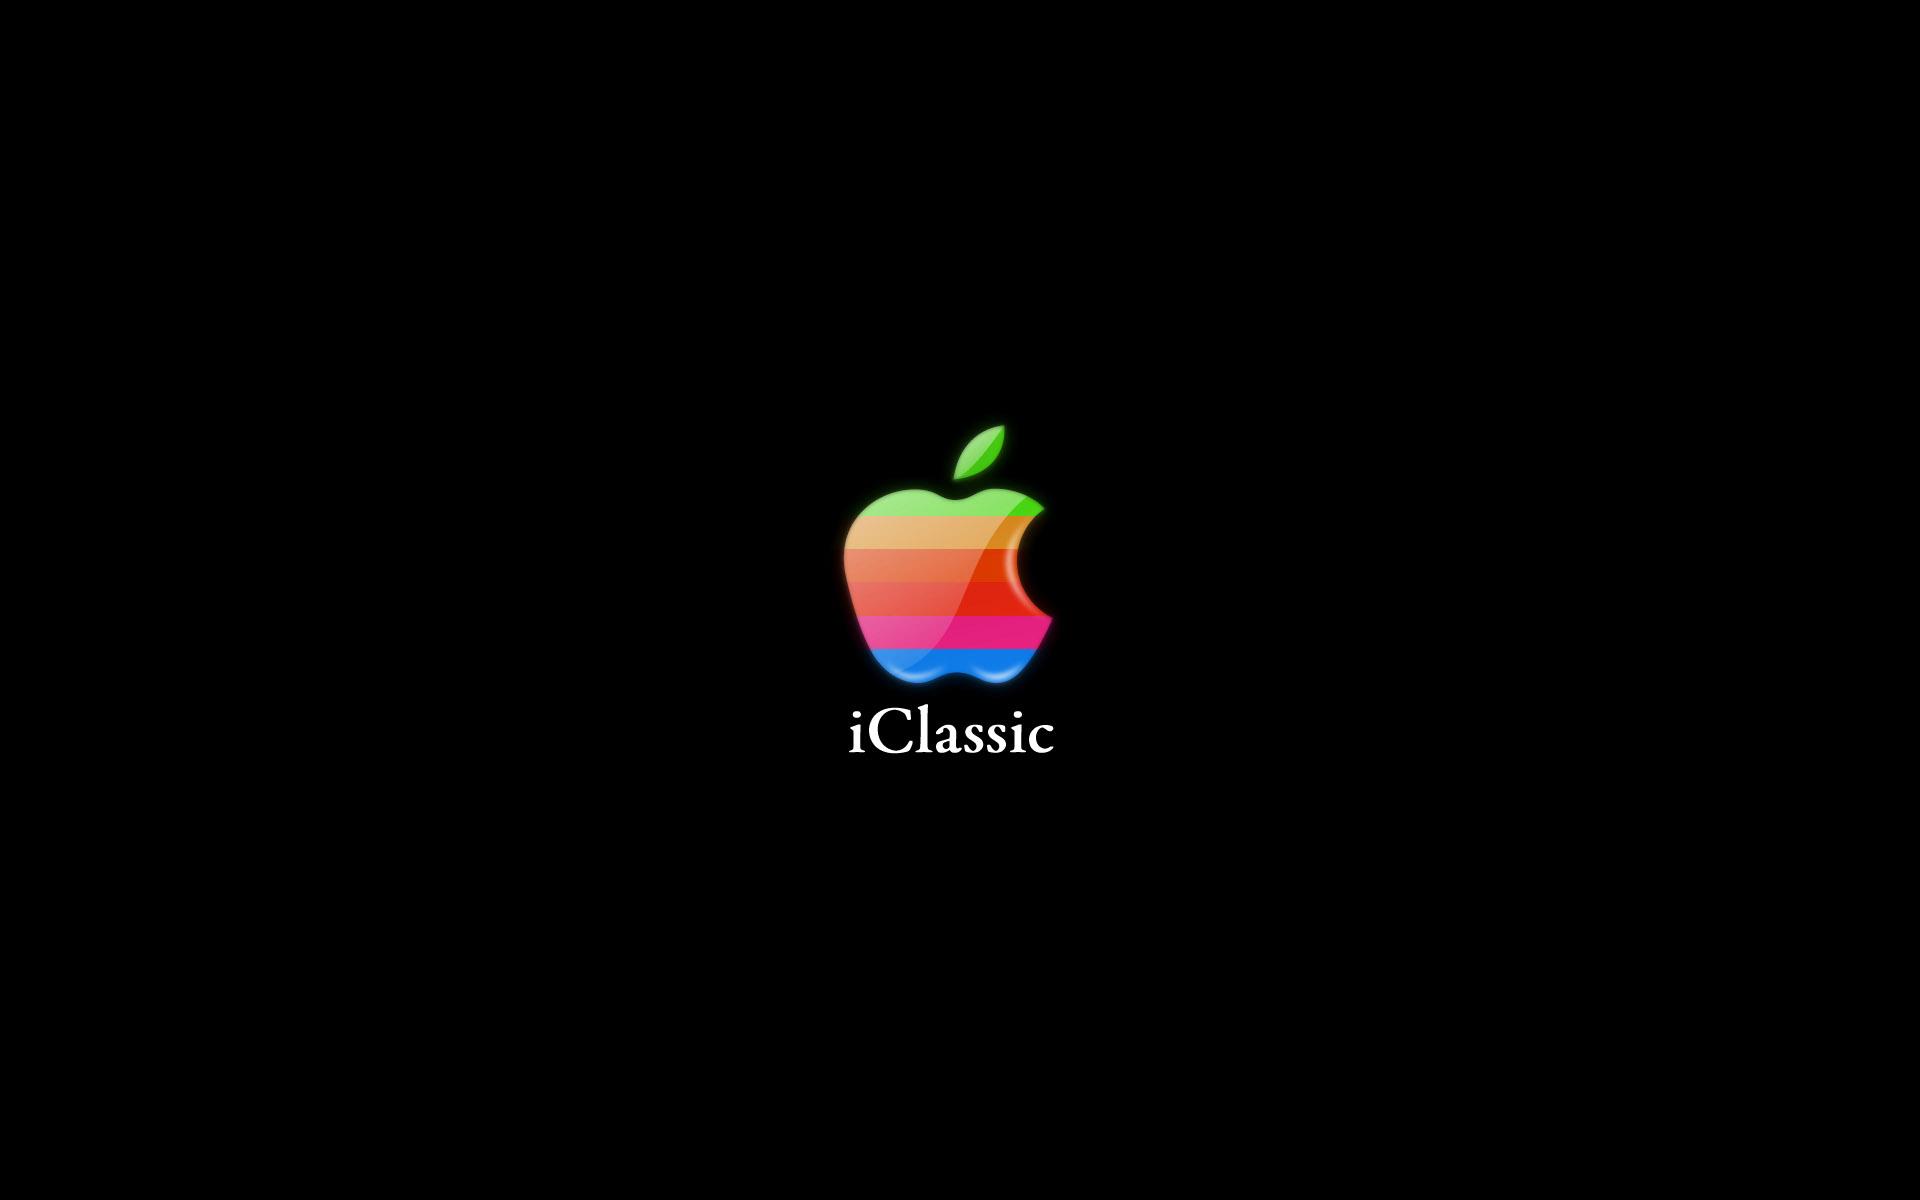 URL httpwwwtechmyndcom20 elegant apple mac hd wallpapers set 4 1920x1200